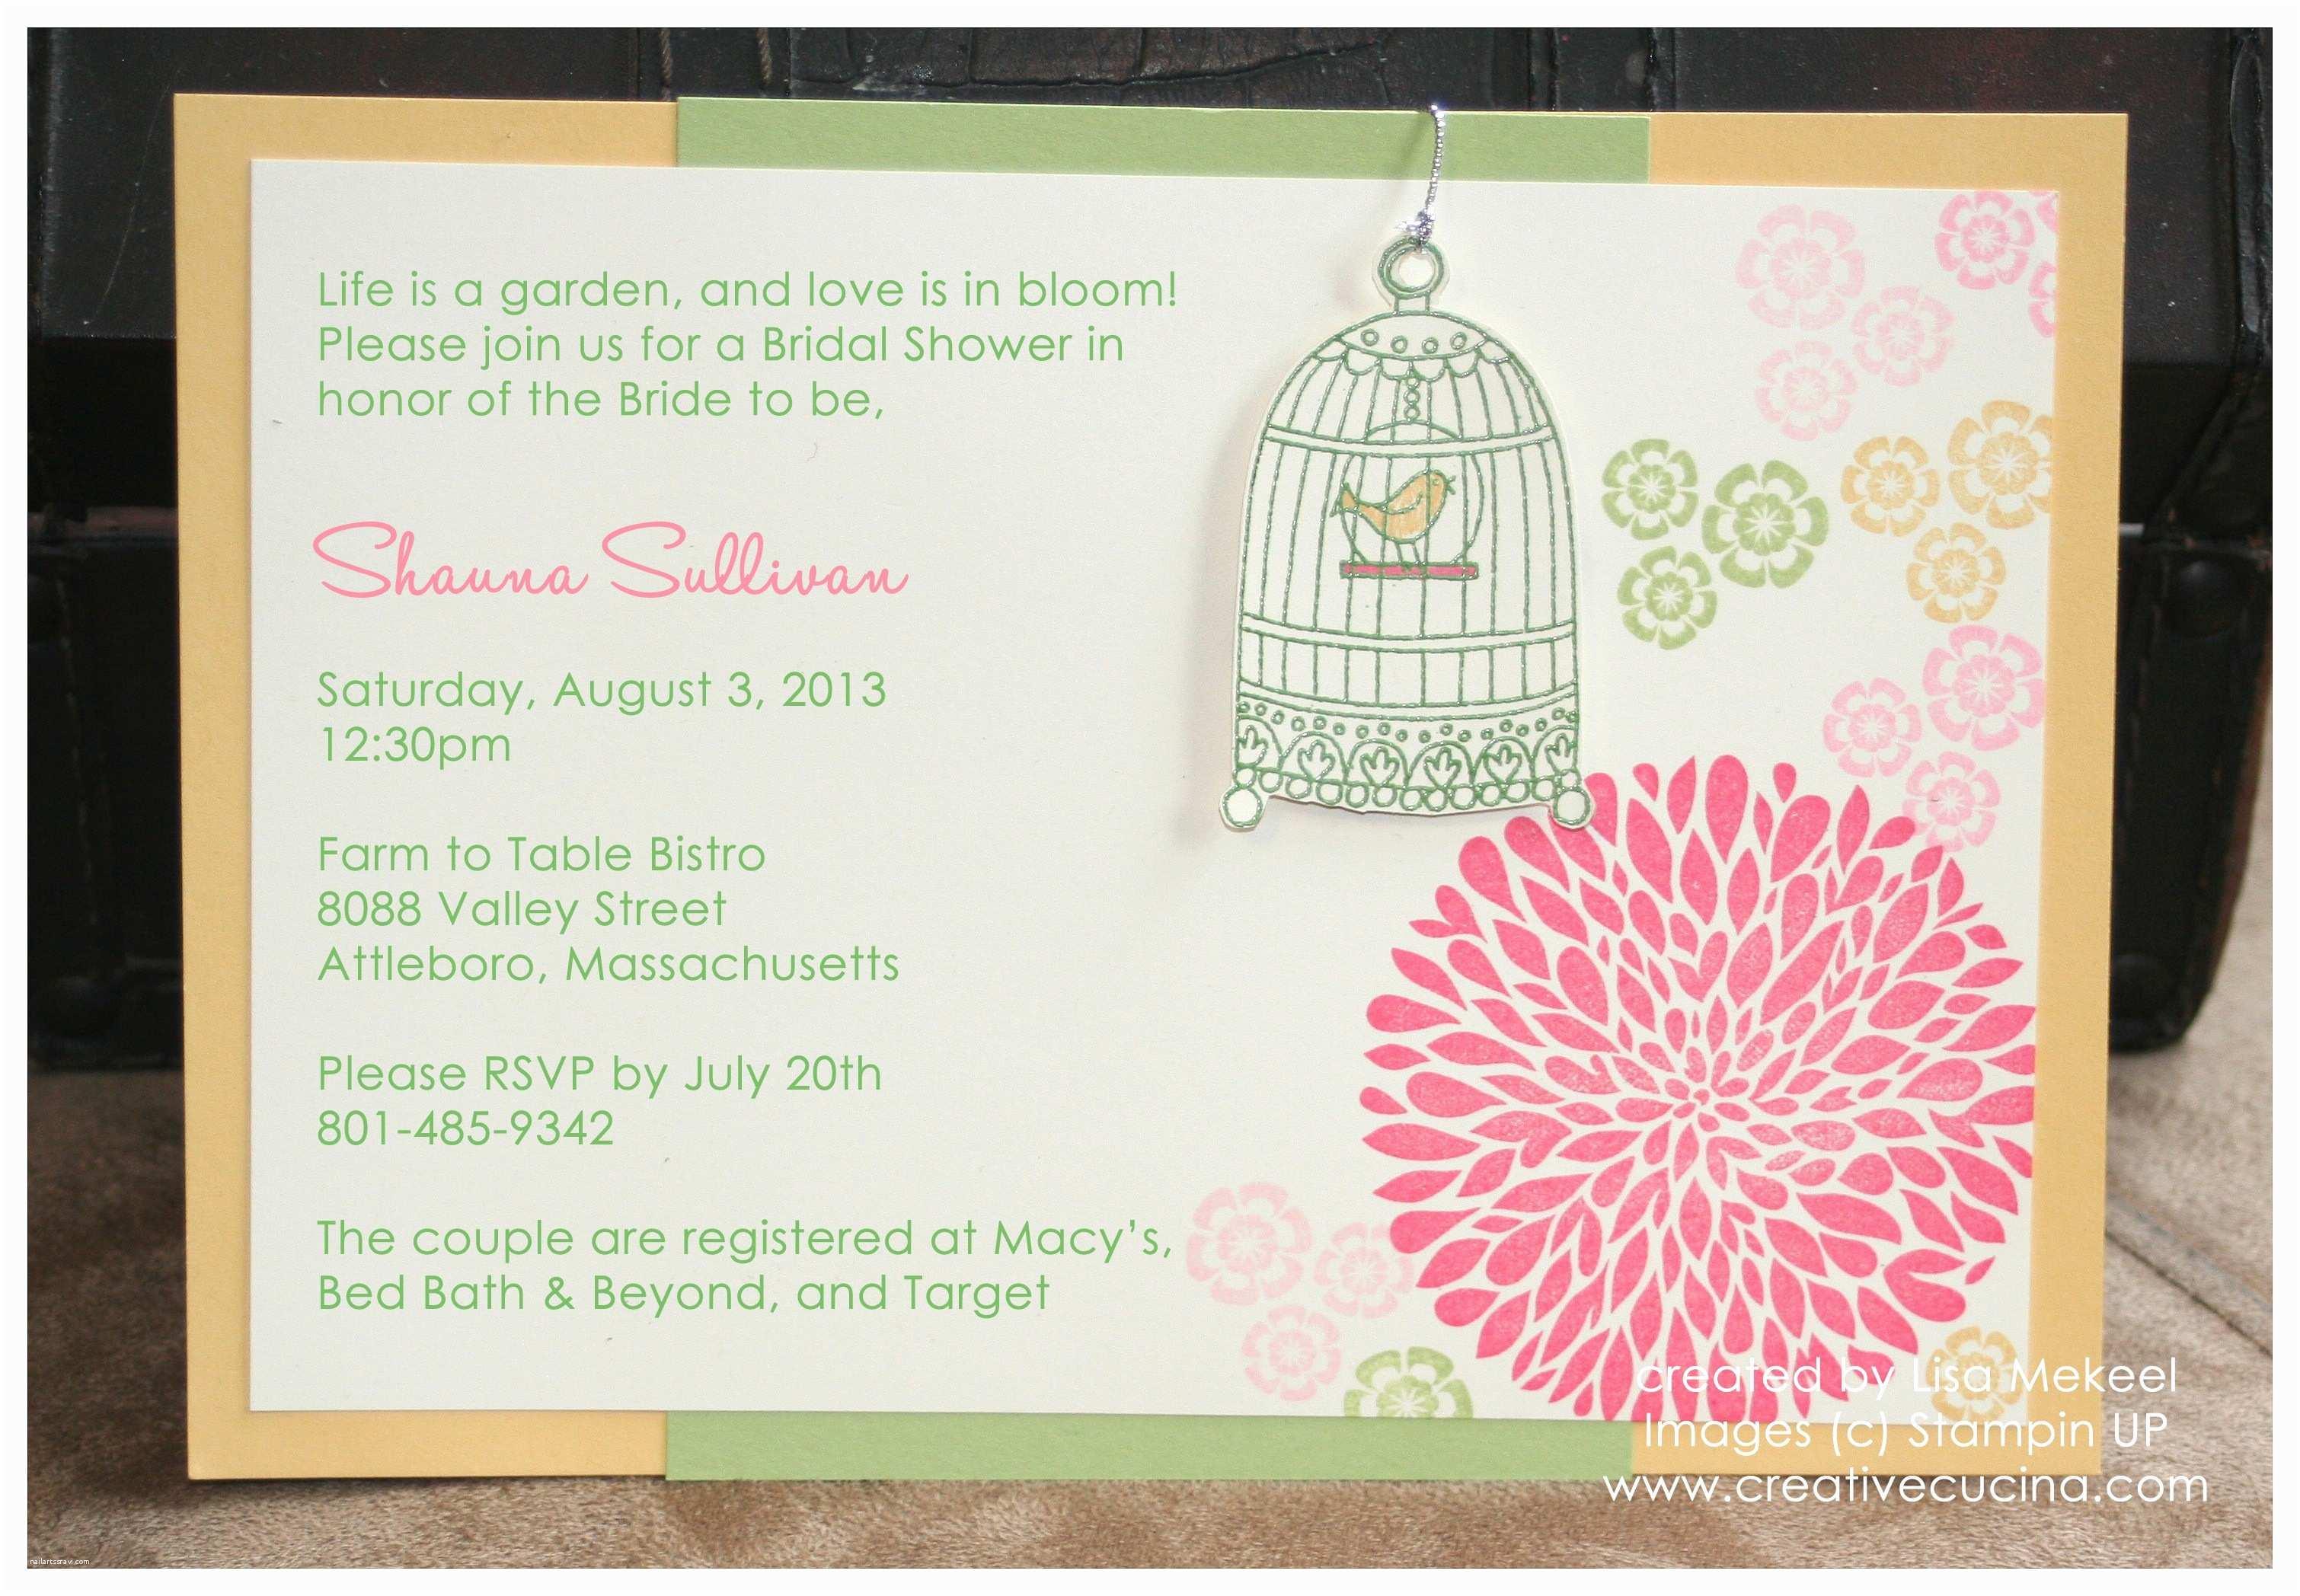 Jewish Wedding Invitation Wording Samples Sample Jewish Wedding Invitation Wording Best Jewish